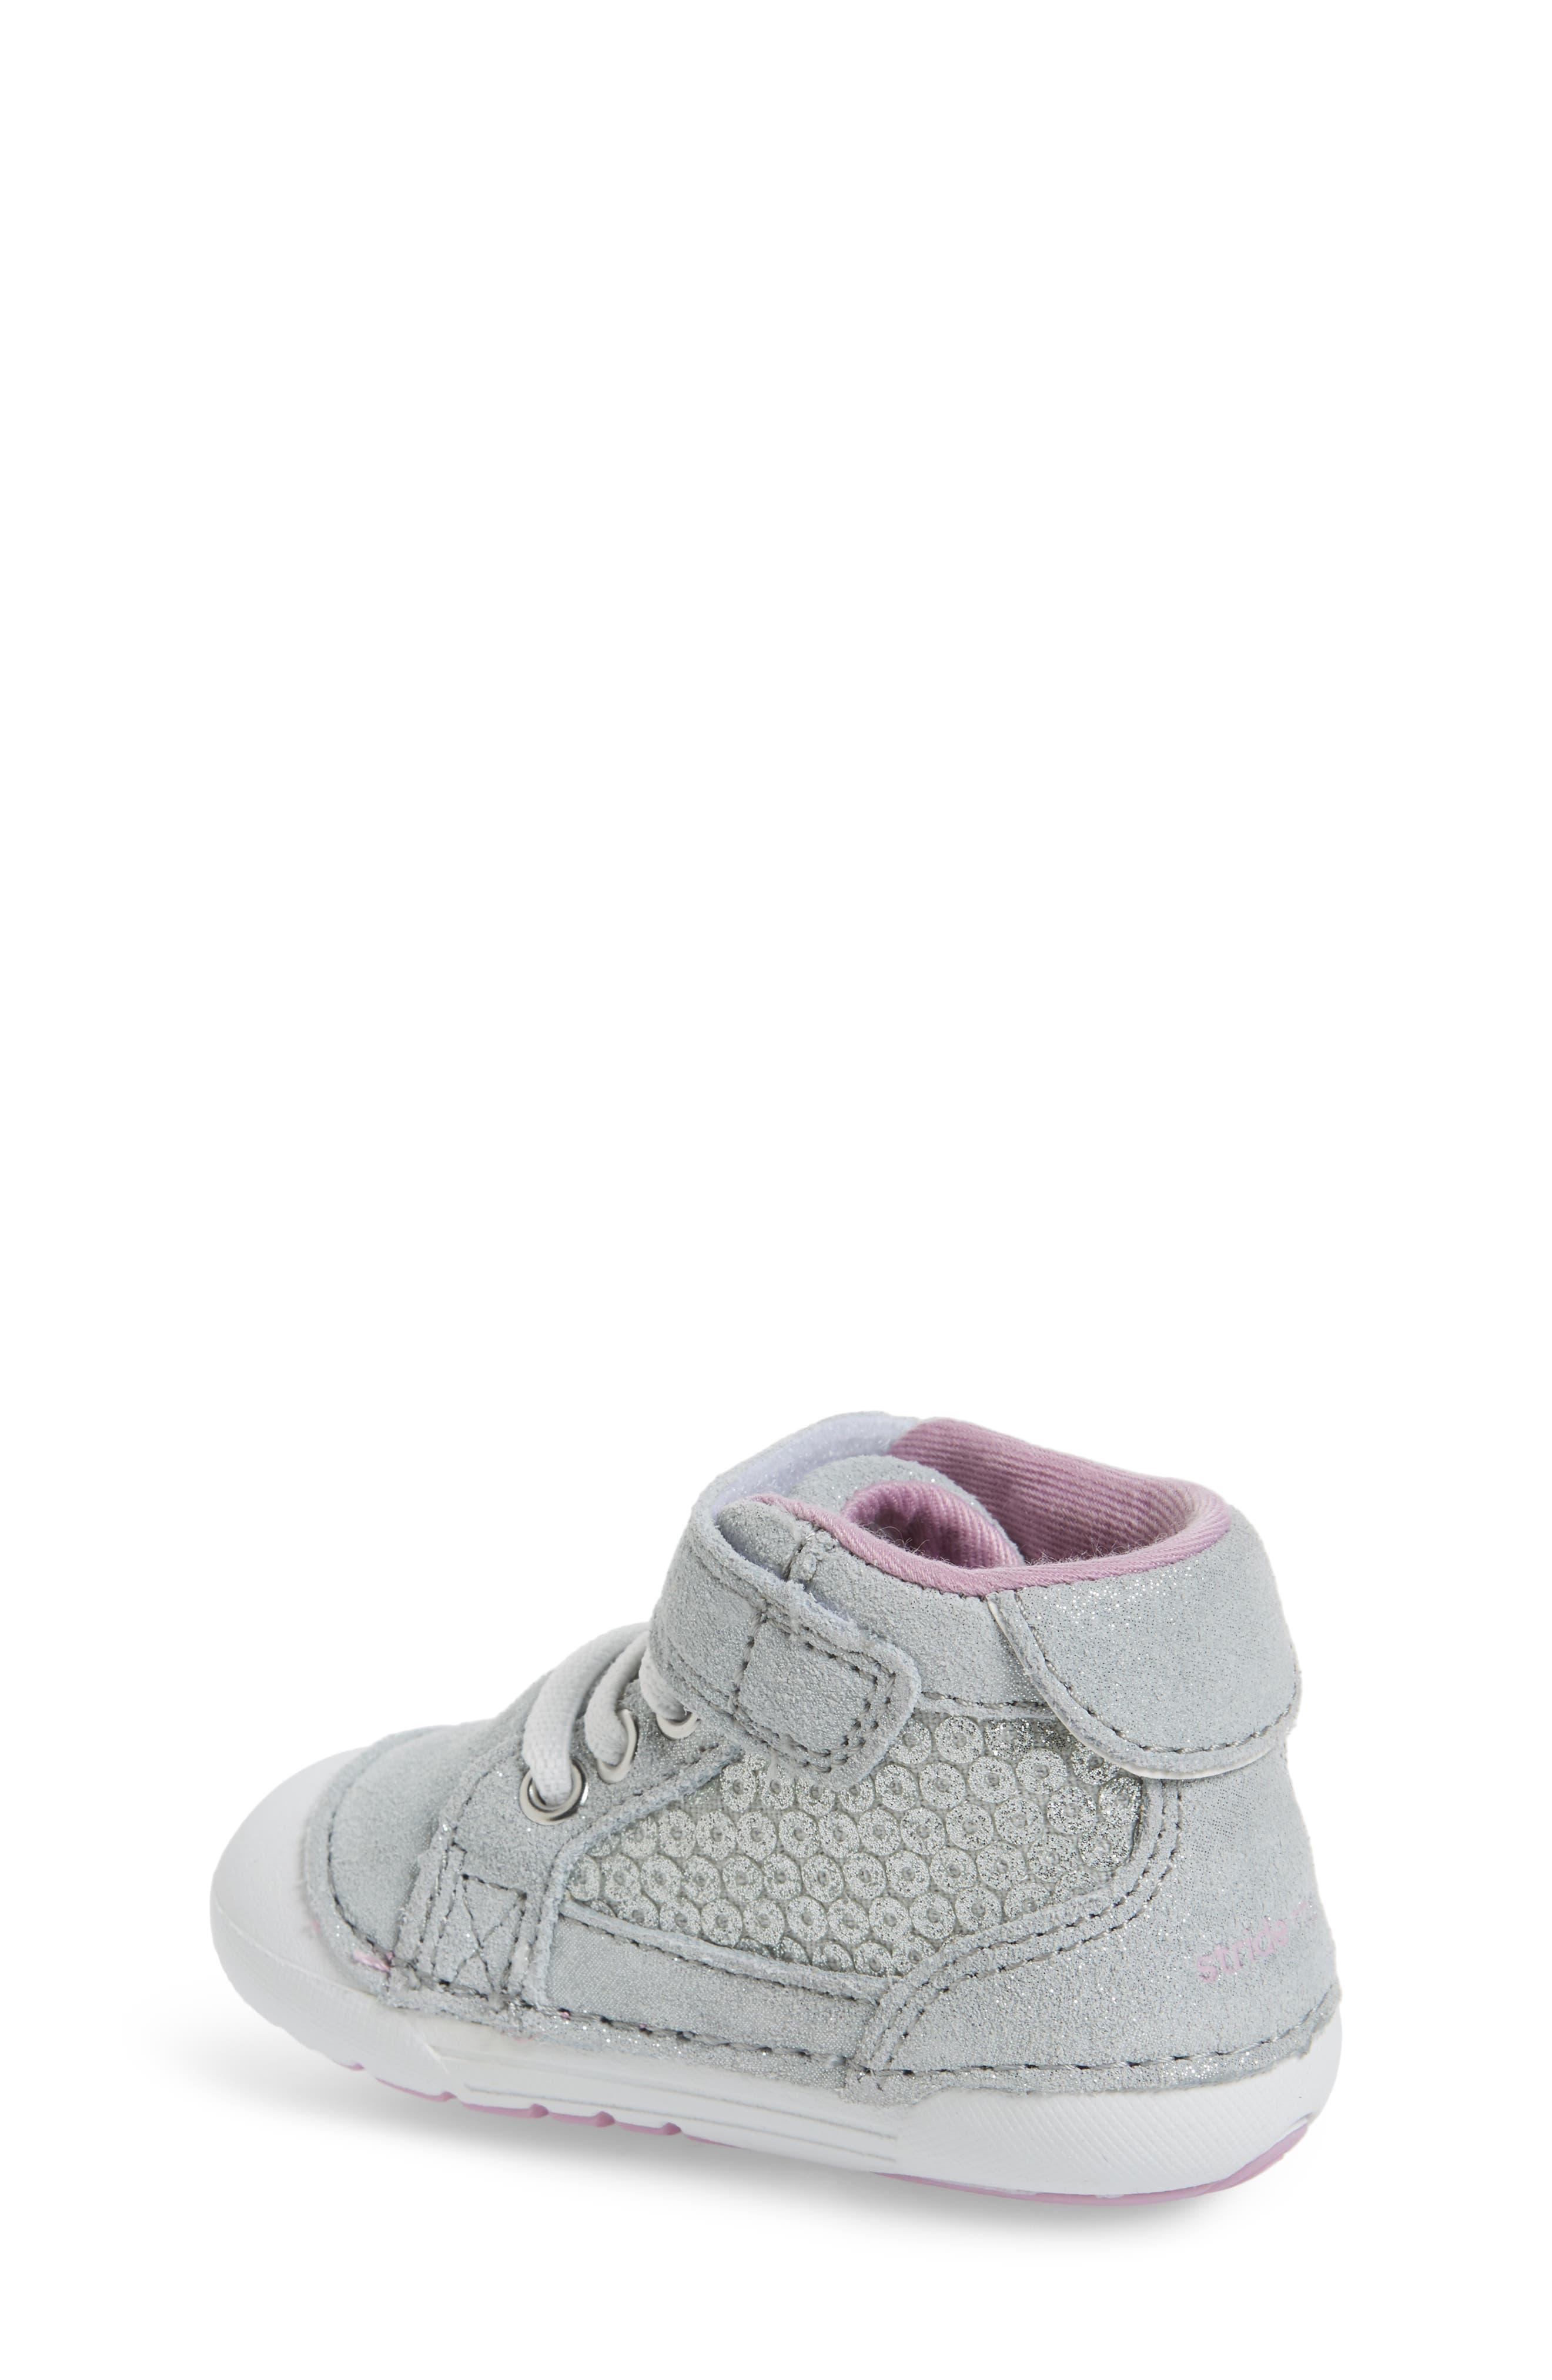 Alternate Image 2  - Stride Rite Soft Motion™ Jada High Top Sneaker (Baby & Walker)